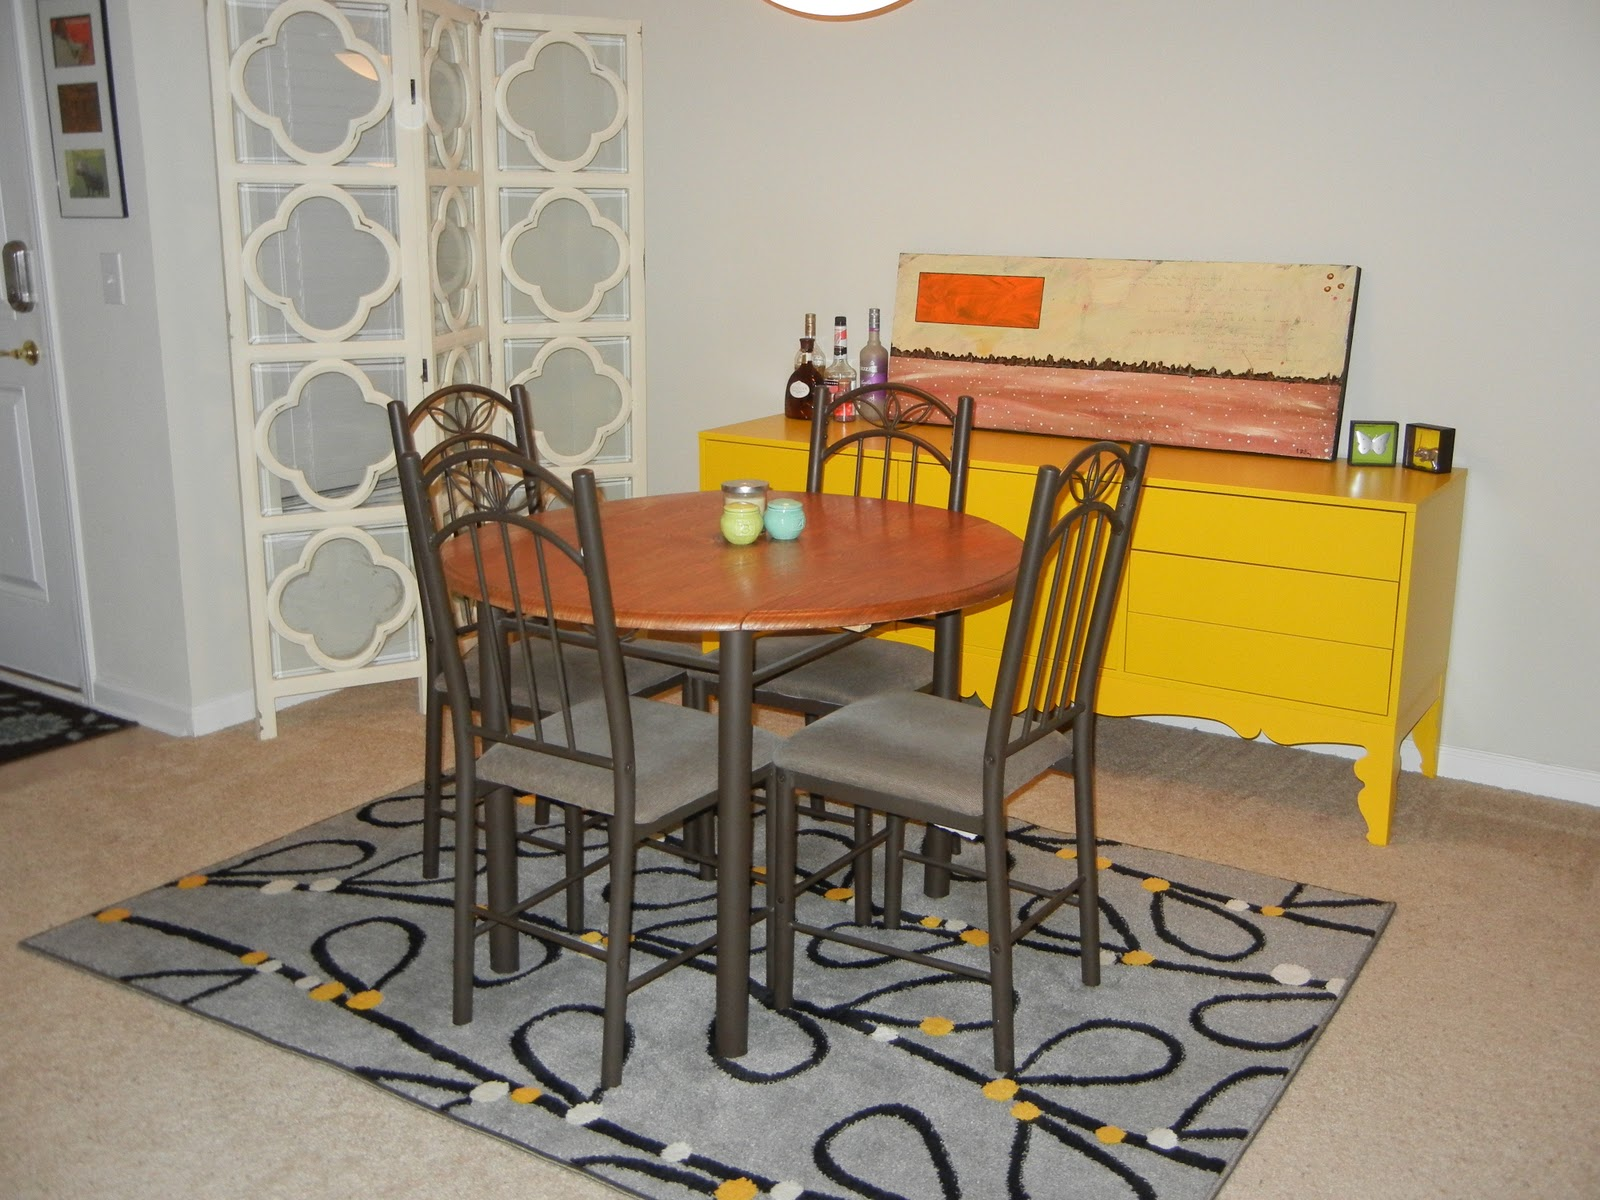 Ikea Yellow Credenza : I love orla kiely ikea trollsta sideboard